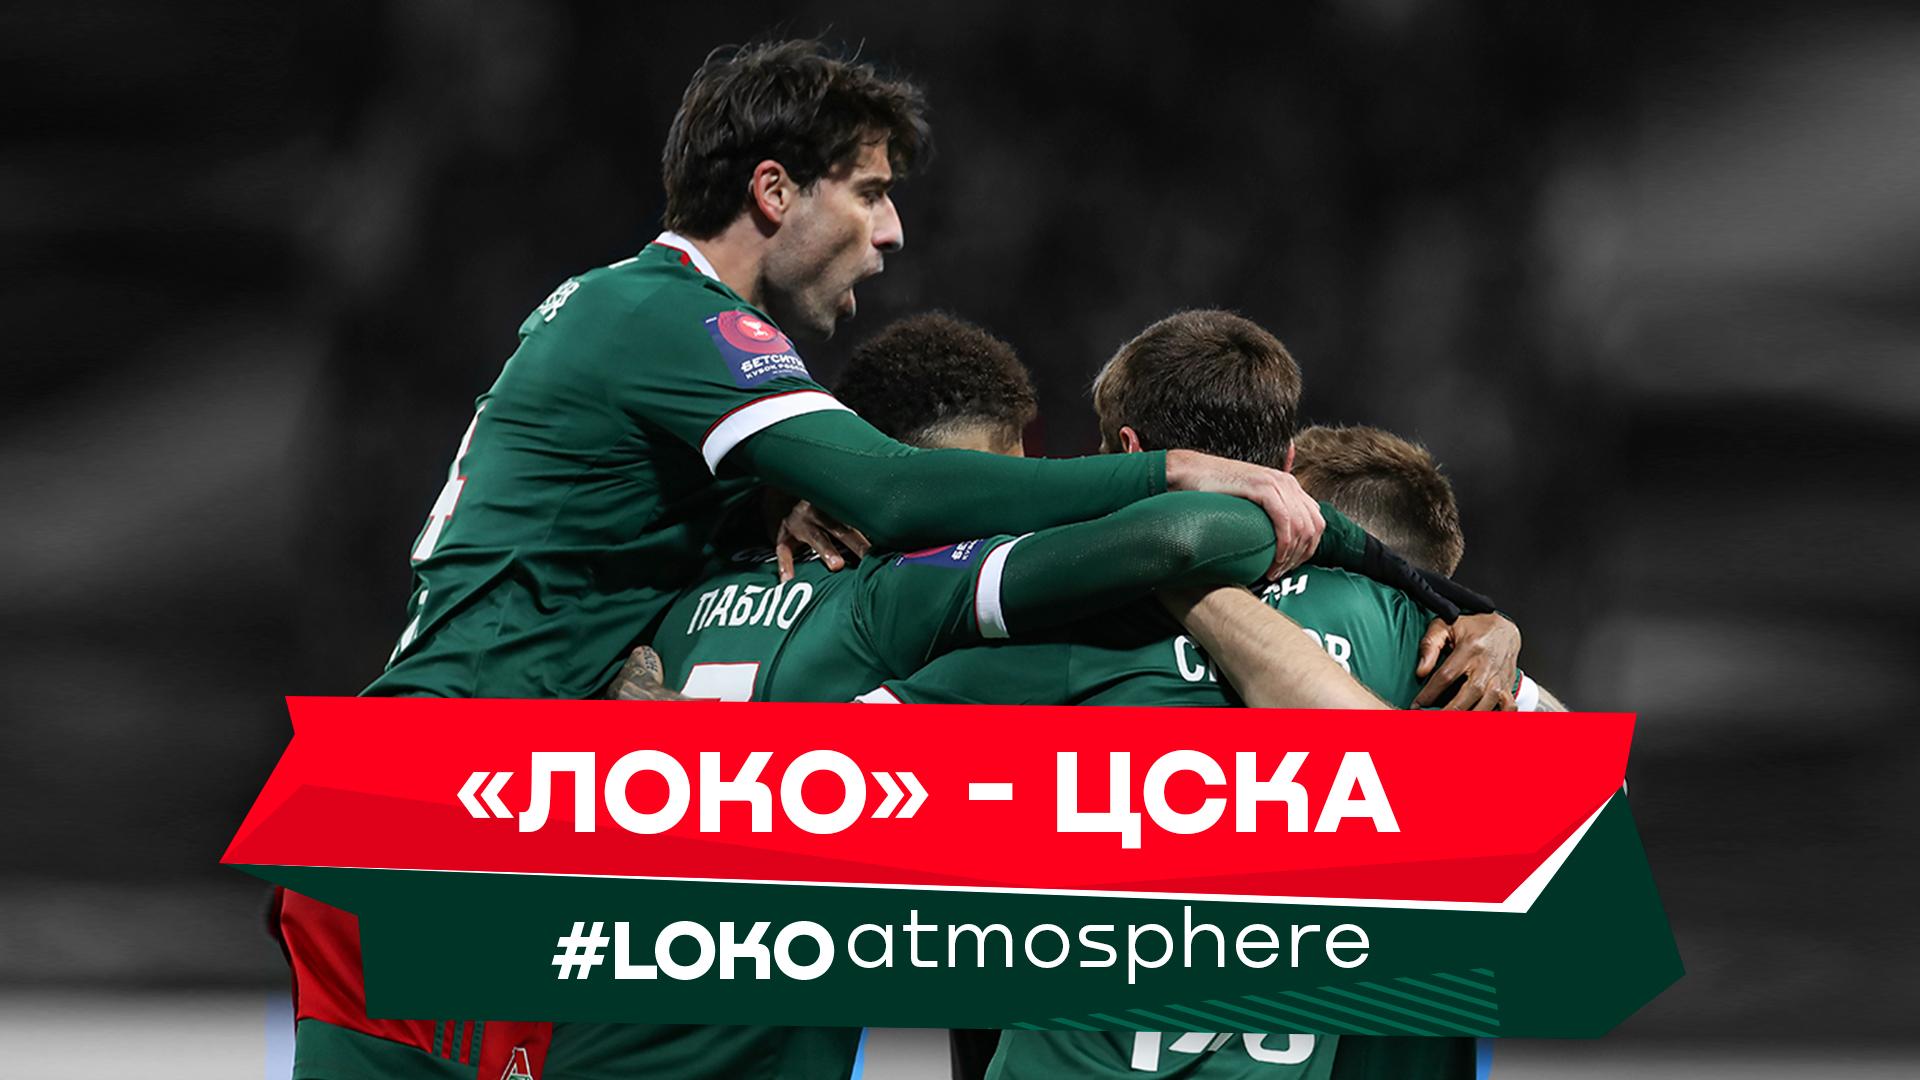 LOKO ATMOSPHERE // «Локомотив» 3:0 ЦСКА // 21 апреля 2021 г.